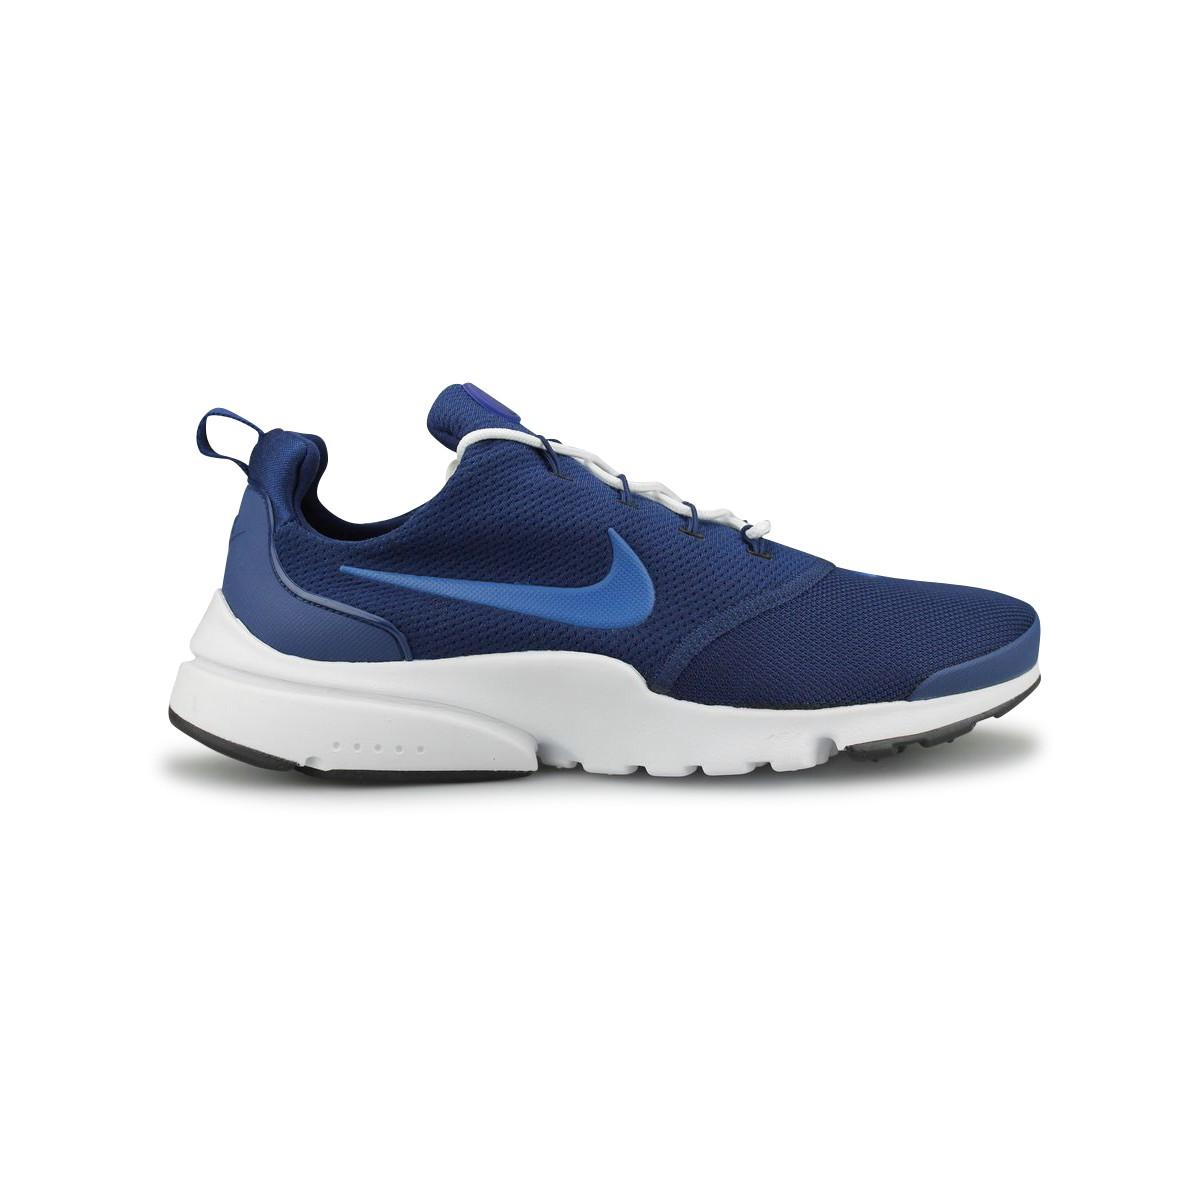 Street 406 Fly 908019 Shoes Presto Bleu Nike Homme Blanc Addict 0SBqWYH